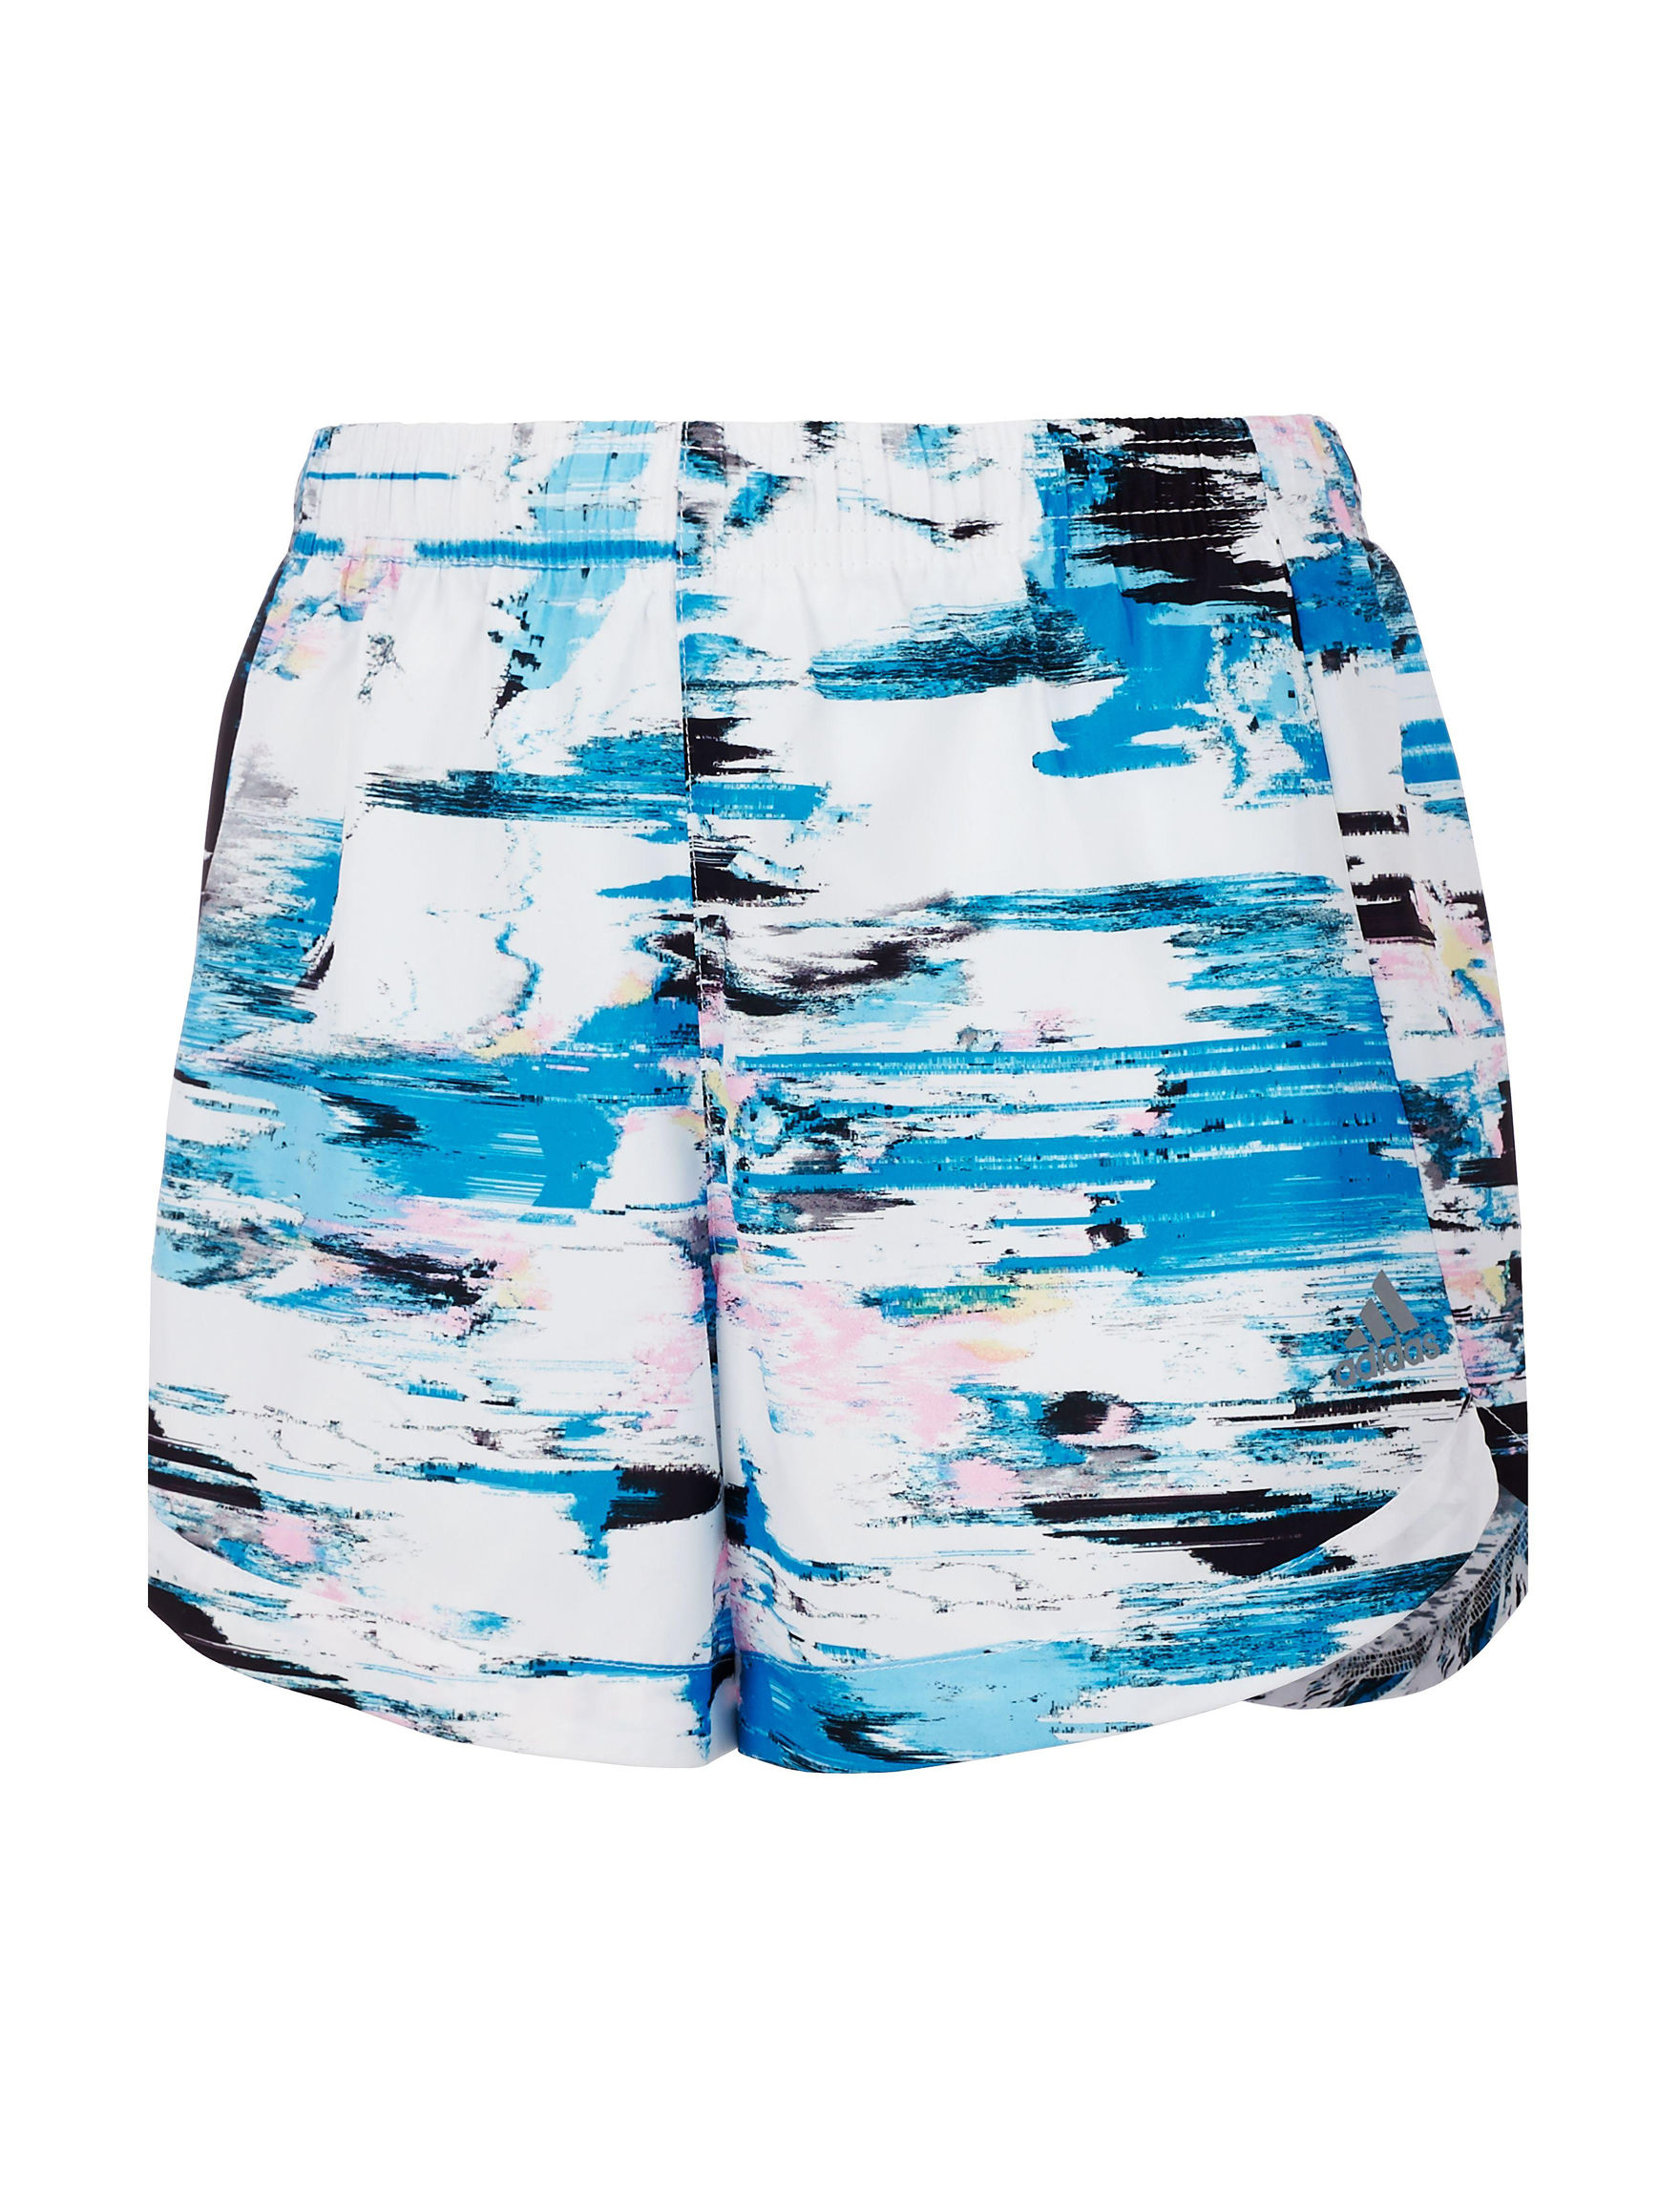 Adidas White / Blue Multi